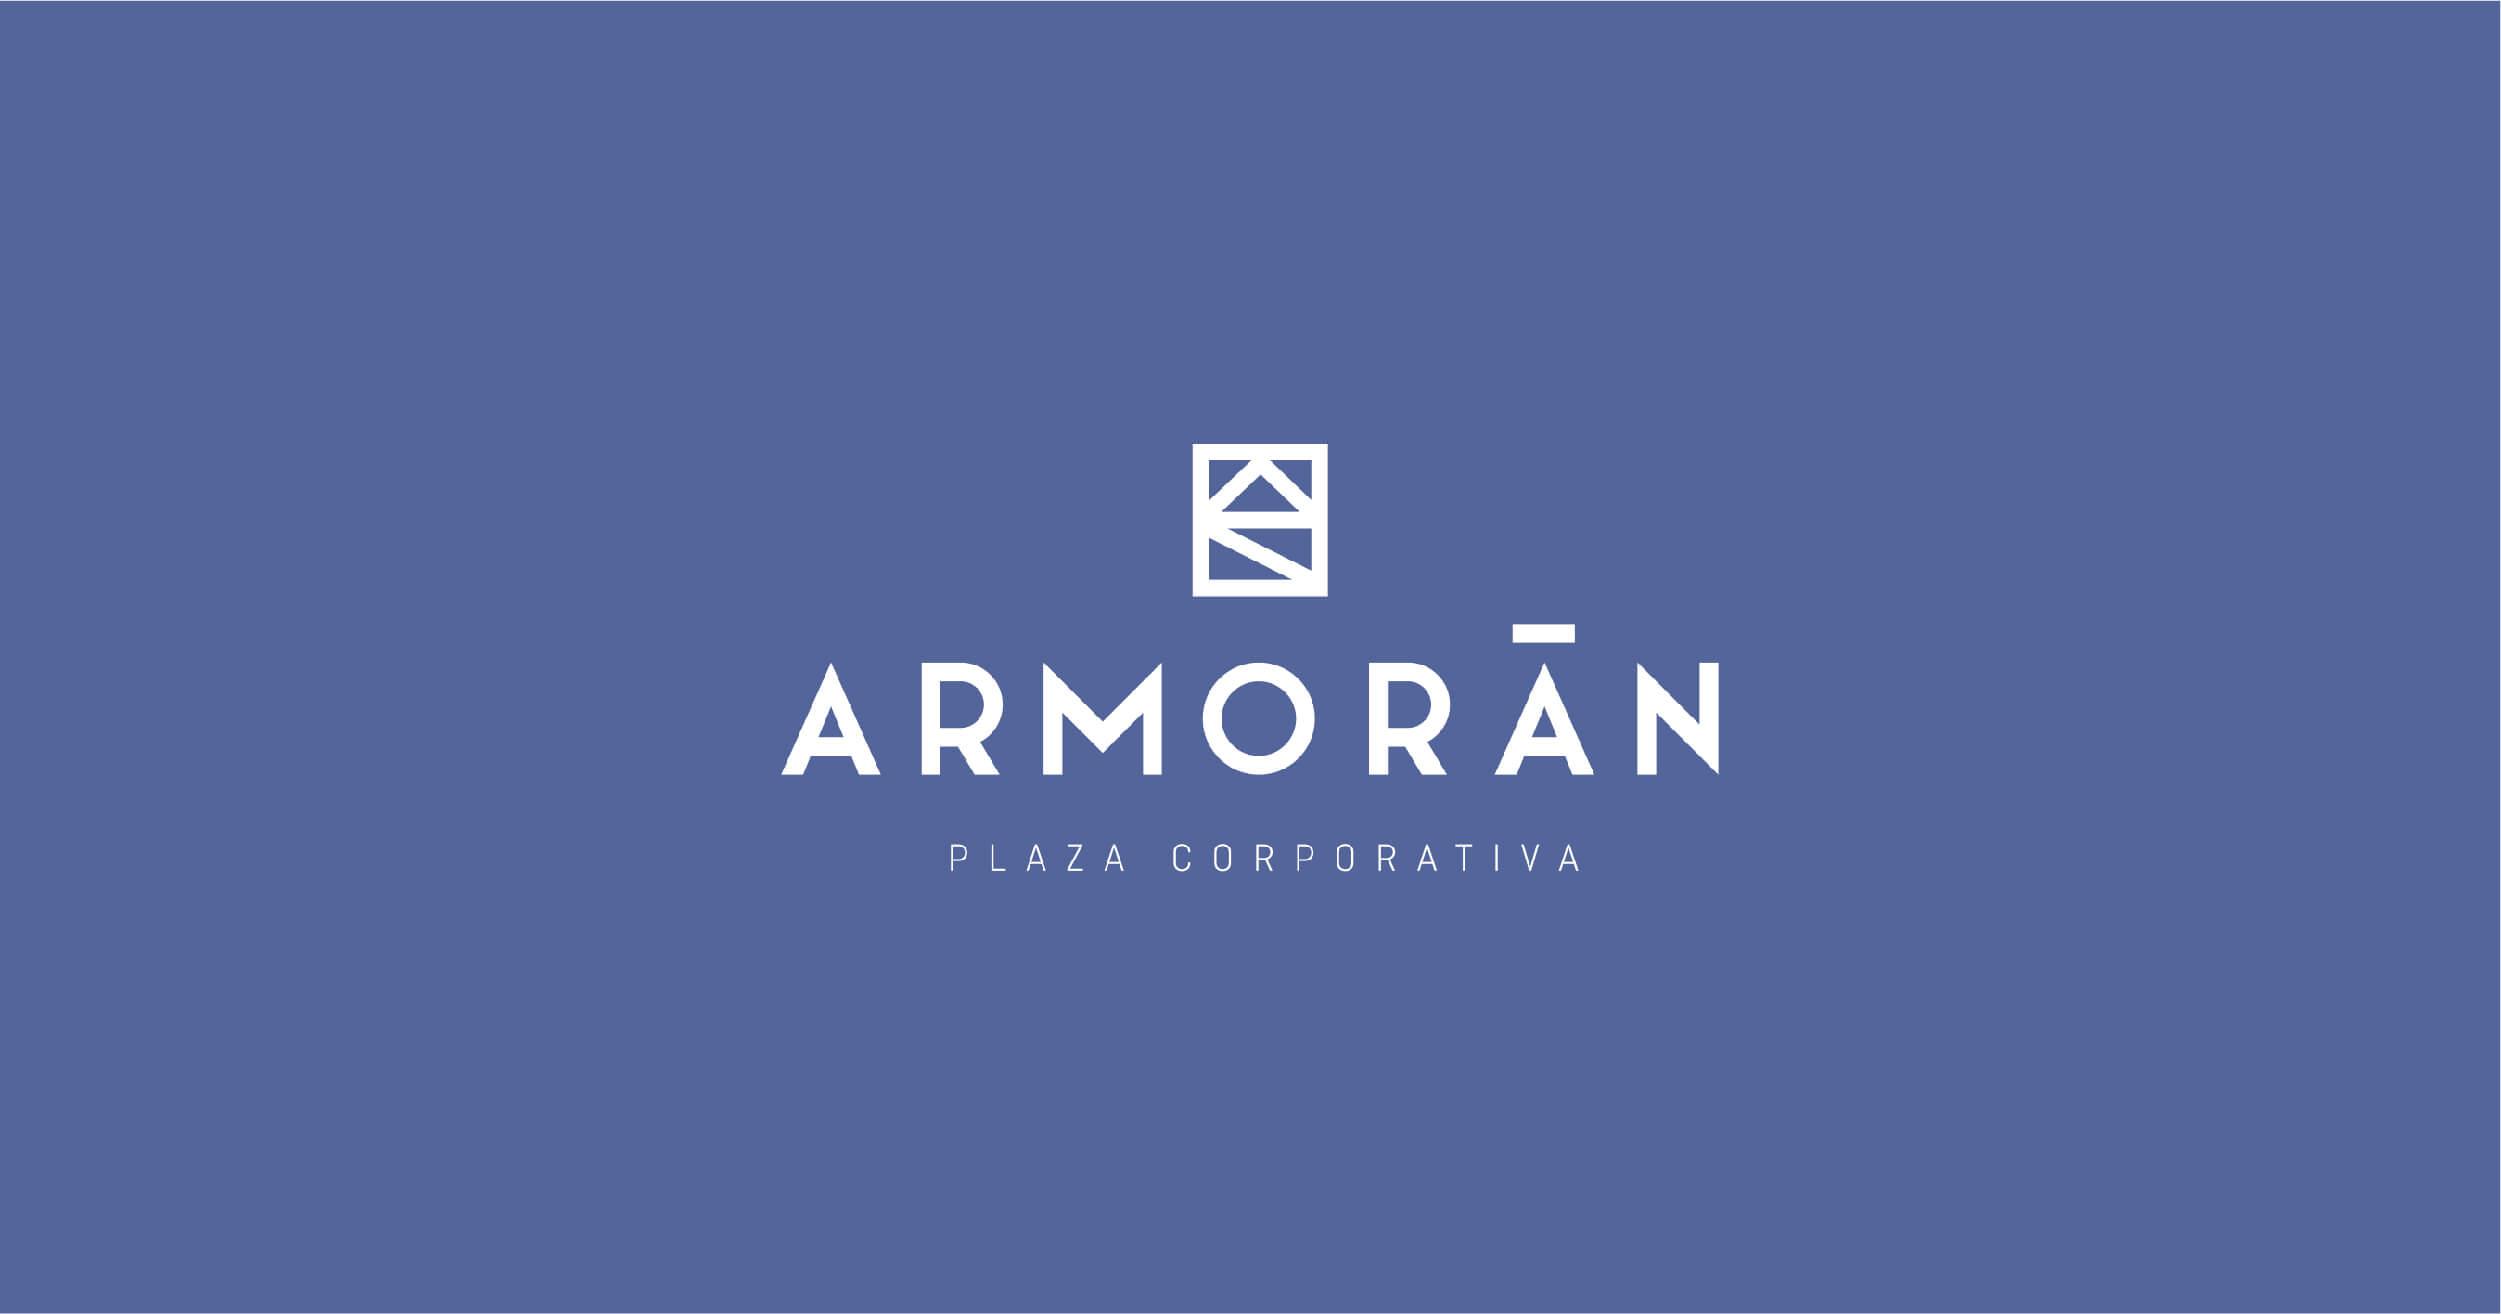 FullFrame-Photomkt-Portafolio-Cover-Armorán